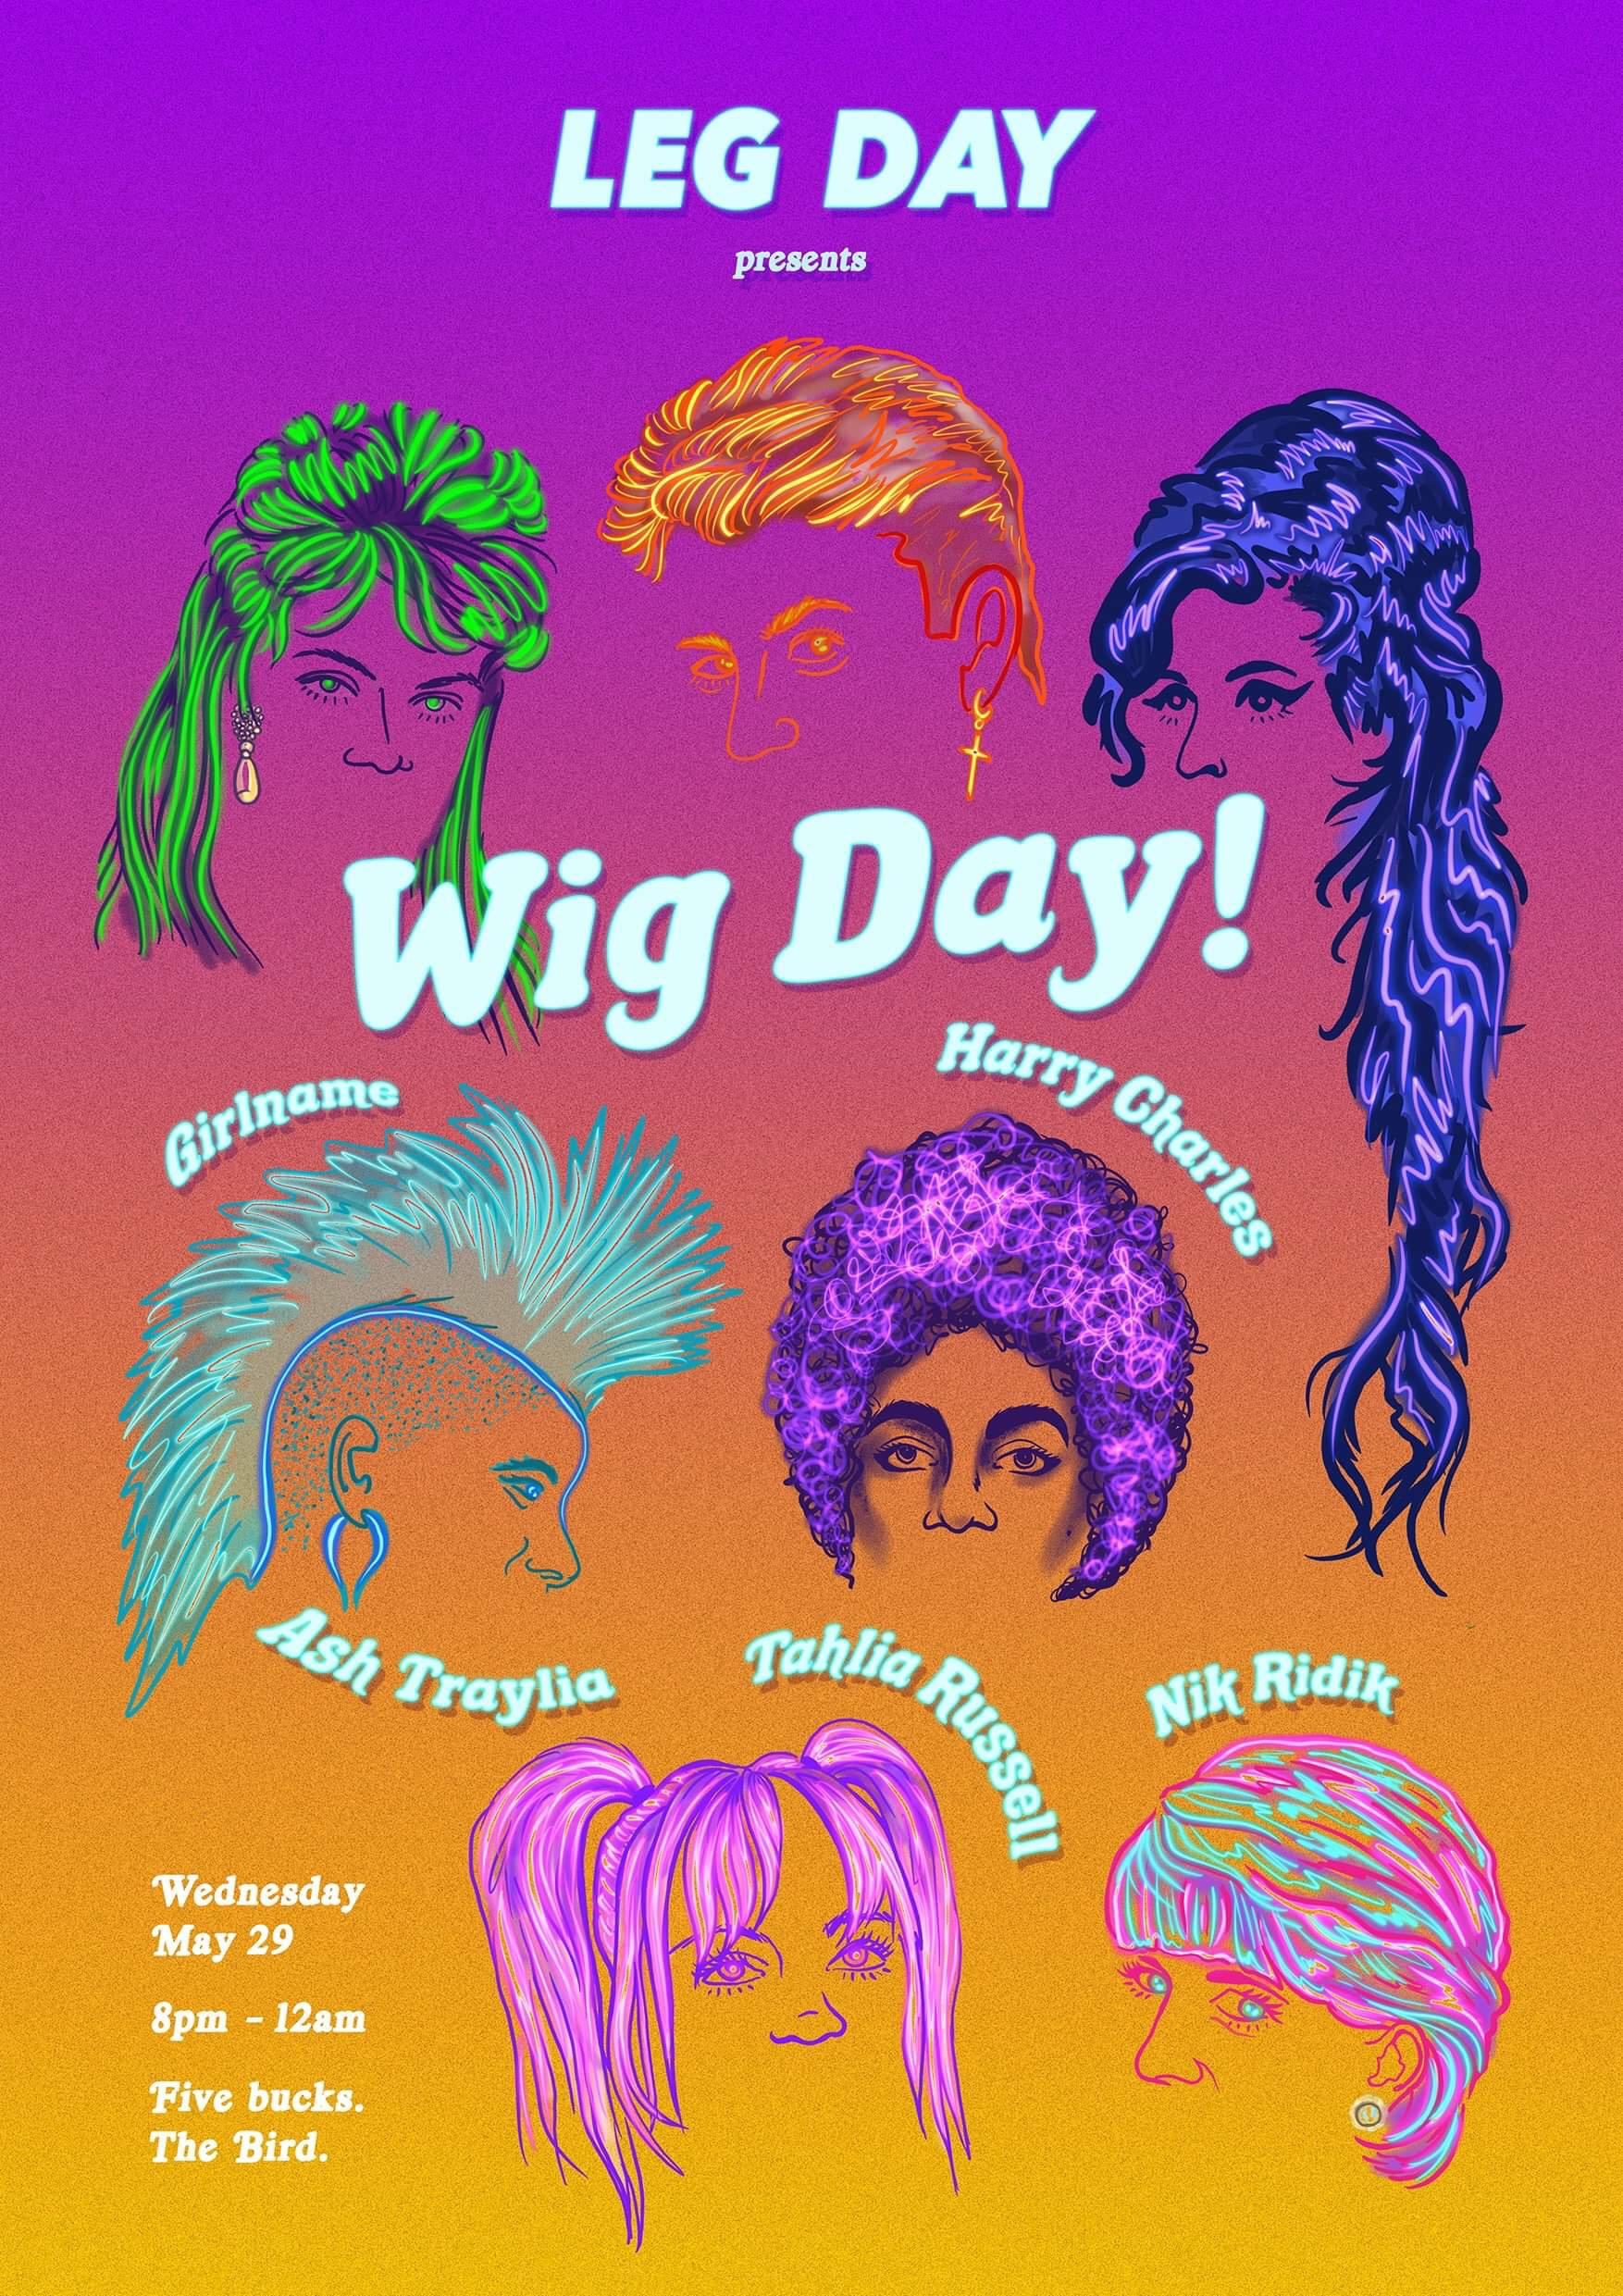 Artwork for Event poster- Leg Day